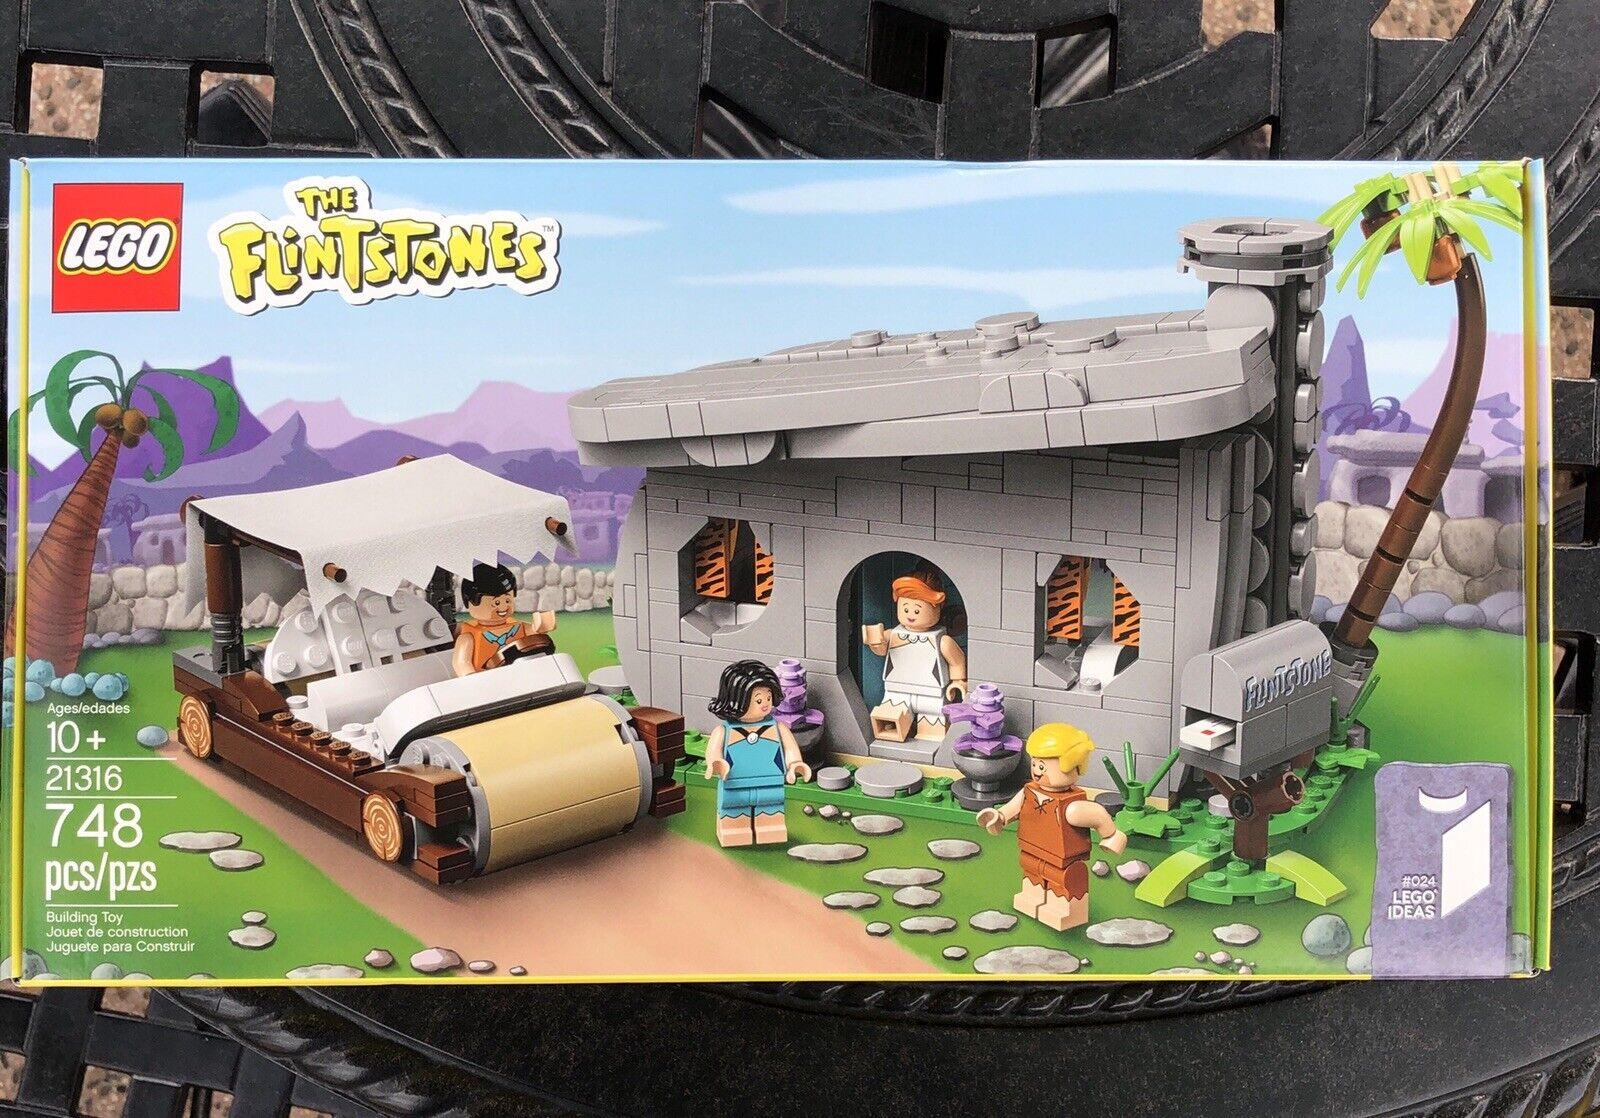 LEGO The Flinstones 21316 on hands (Lego Ideas) 748 Pcs